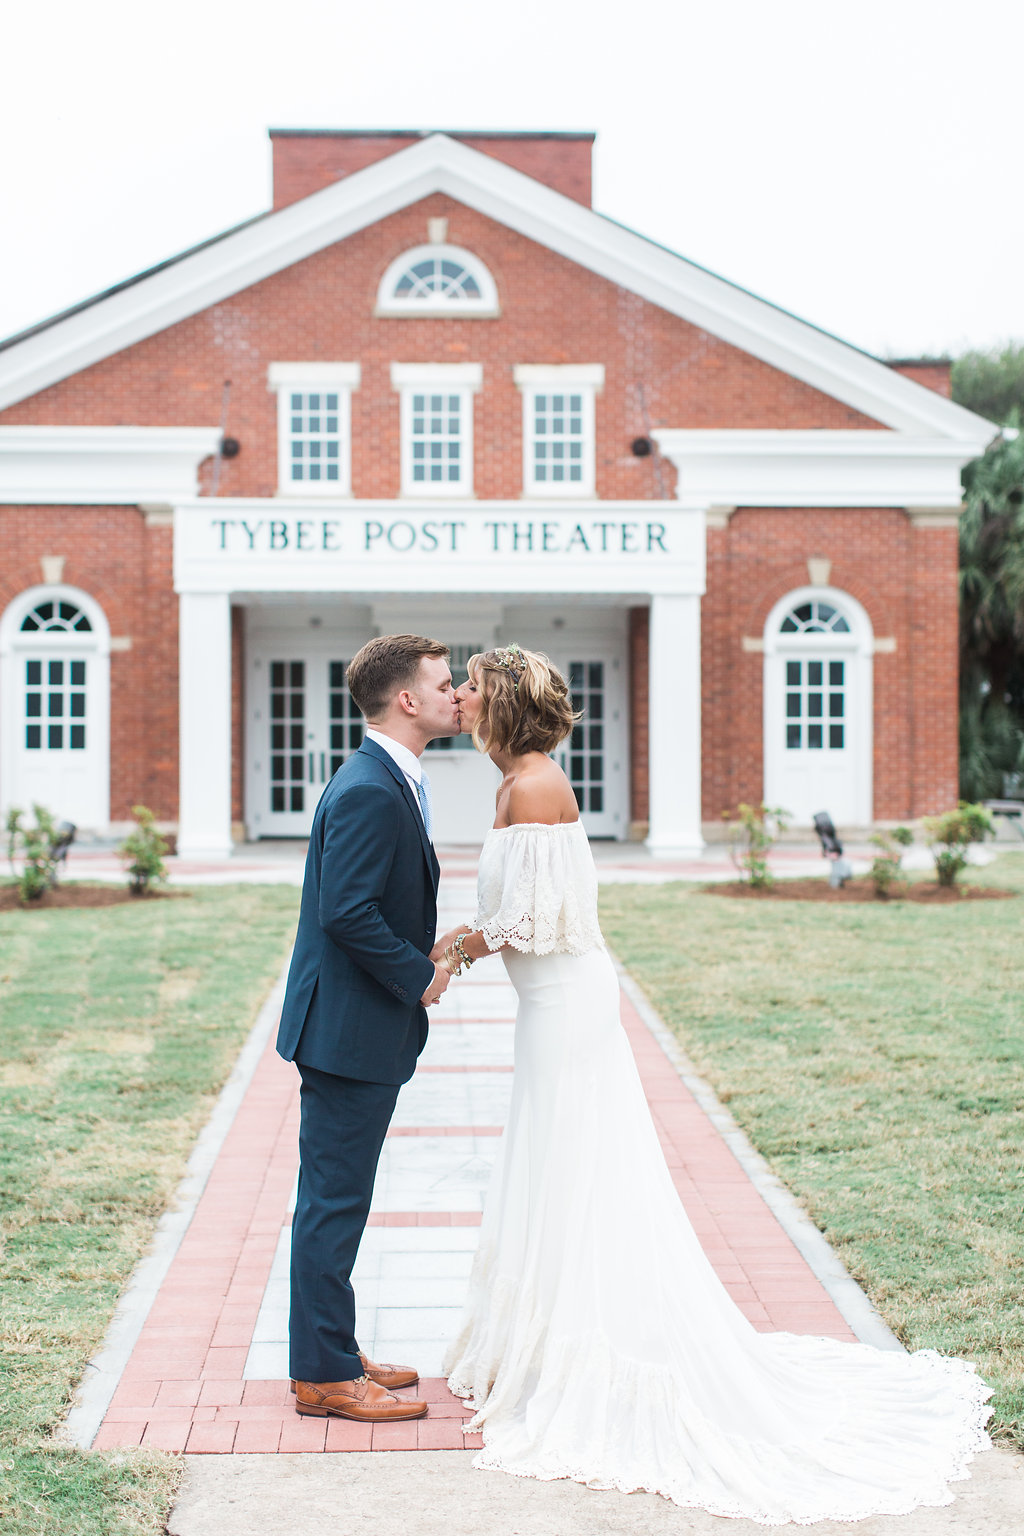 stacey-and-tj-wedding-apartment-b-photography-ivory-and-beau-bridal-boutique-savannah-wedding-dresses-daughters-of-simone-lu-boho-bride-boho-wedding-savannah-boho-wedding-savannah-weddings-savannah-bridal-gowns-savannah-wedding-31.jpg